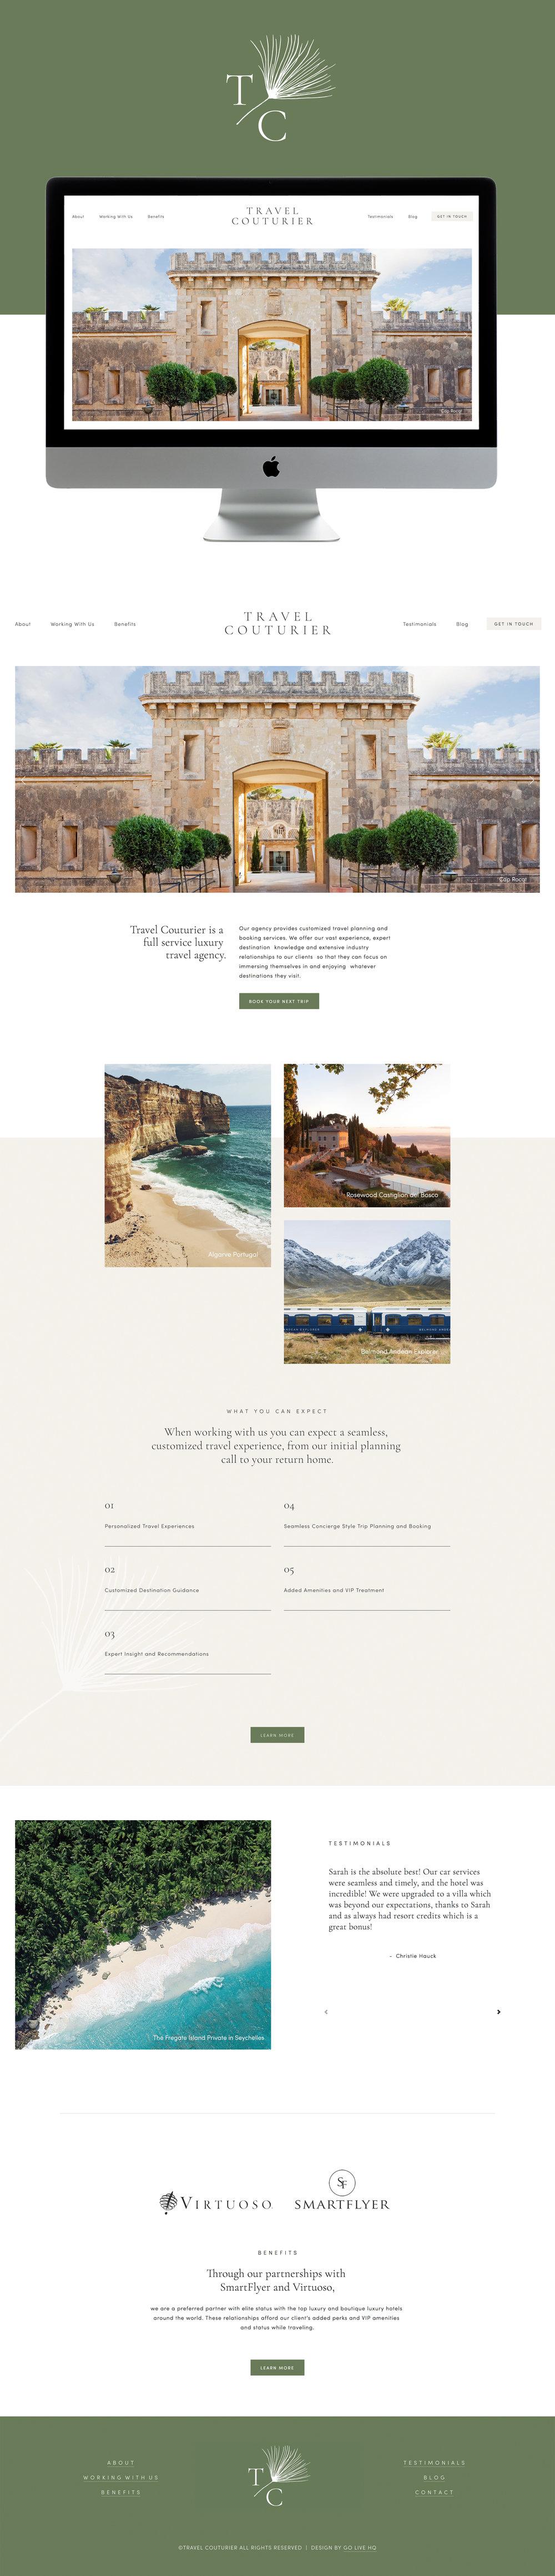 Clean,+Minimal,+Travel+Squarespace+Website+Design+_+By+GoLive.jpg